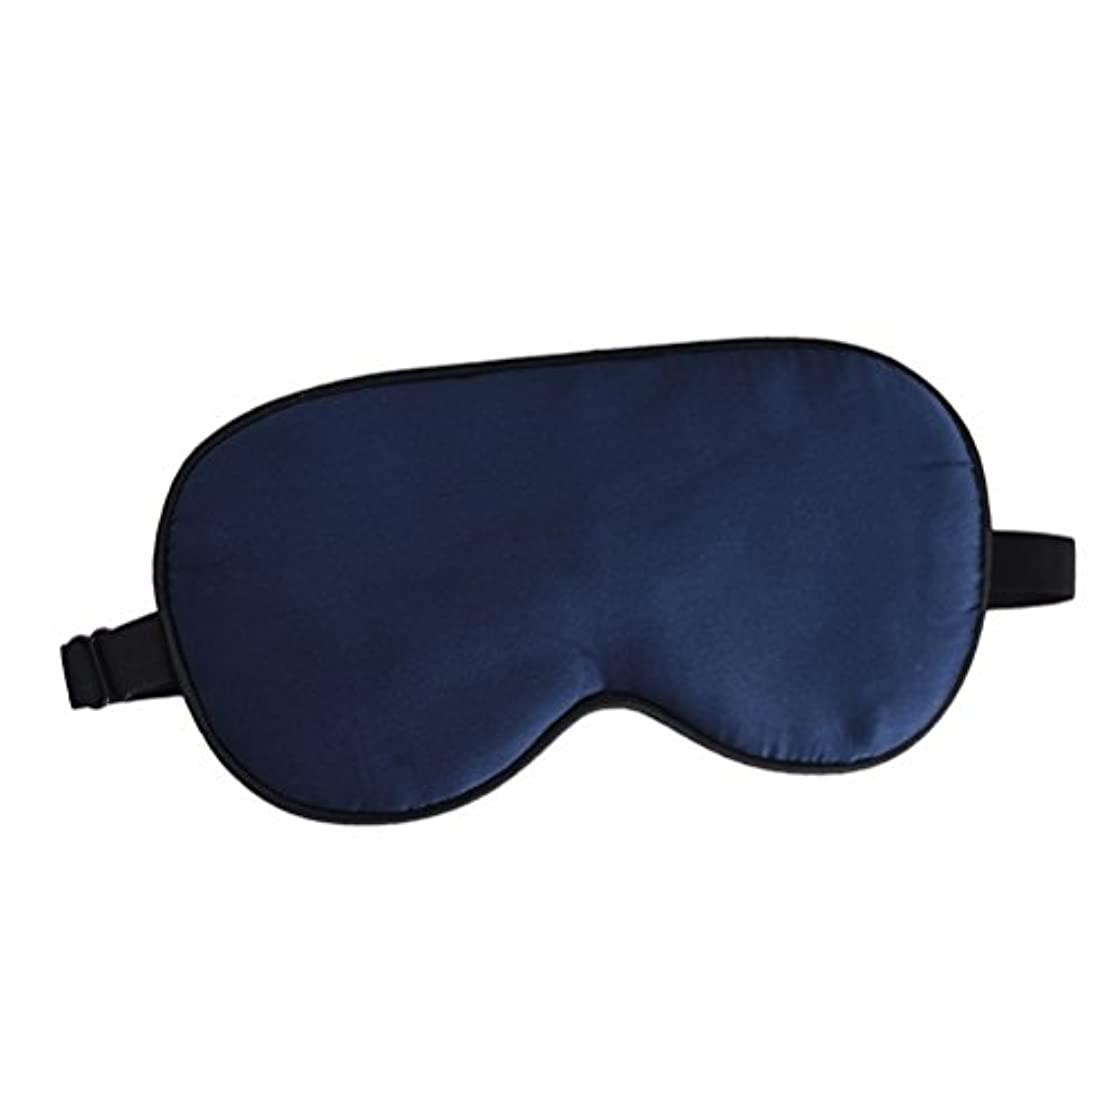 Healifty シルクスリーピングマスクブラインダーパッチアイシェードブラインドフォールドスリープナップメディテーション(ネイビーブルー)